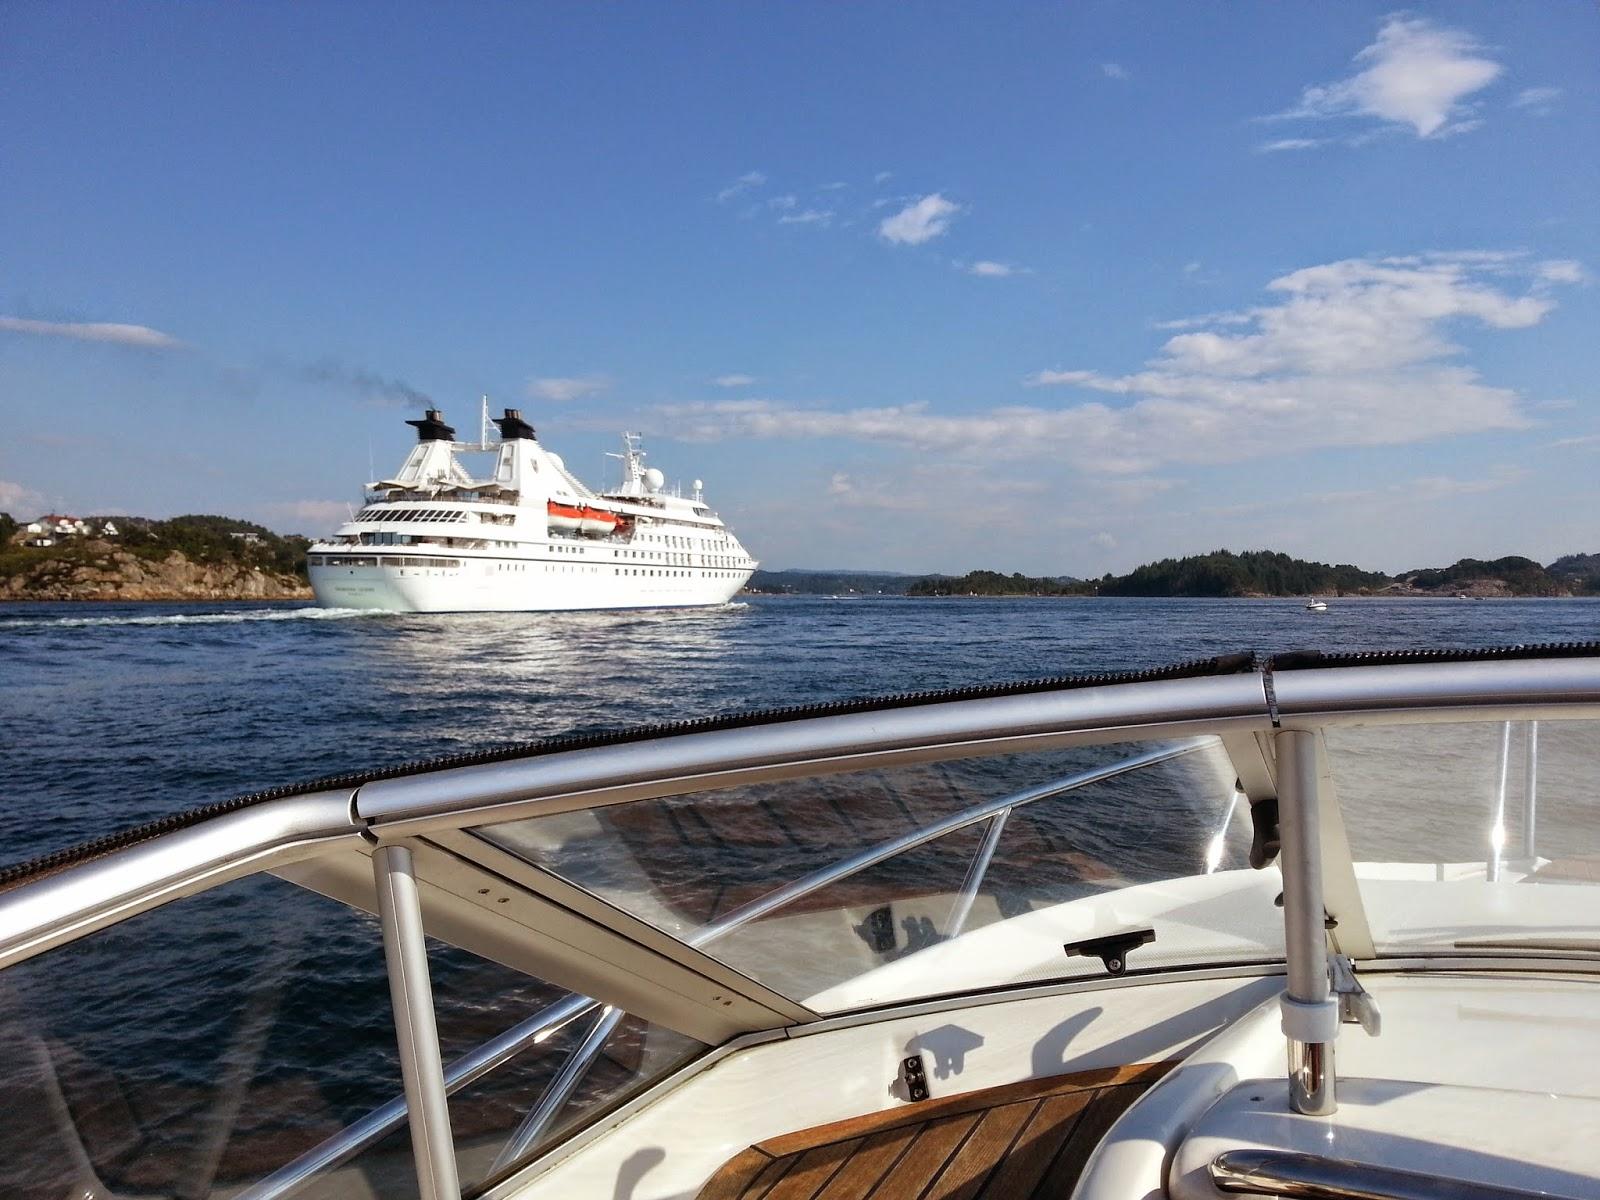 http://shipsinbergen.blogspot.no/2014/07/seabourn-legend.html